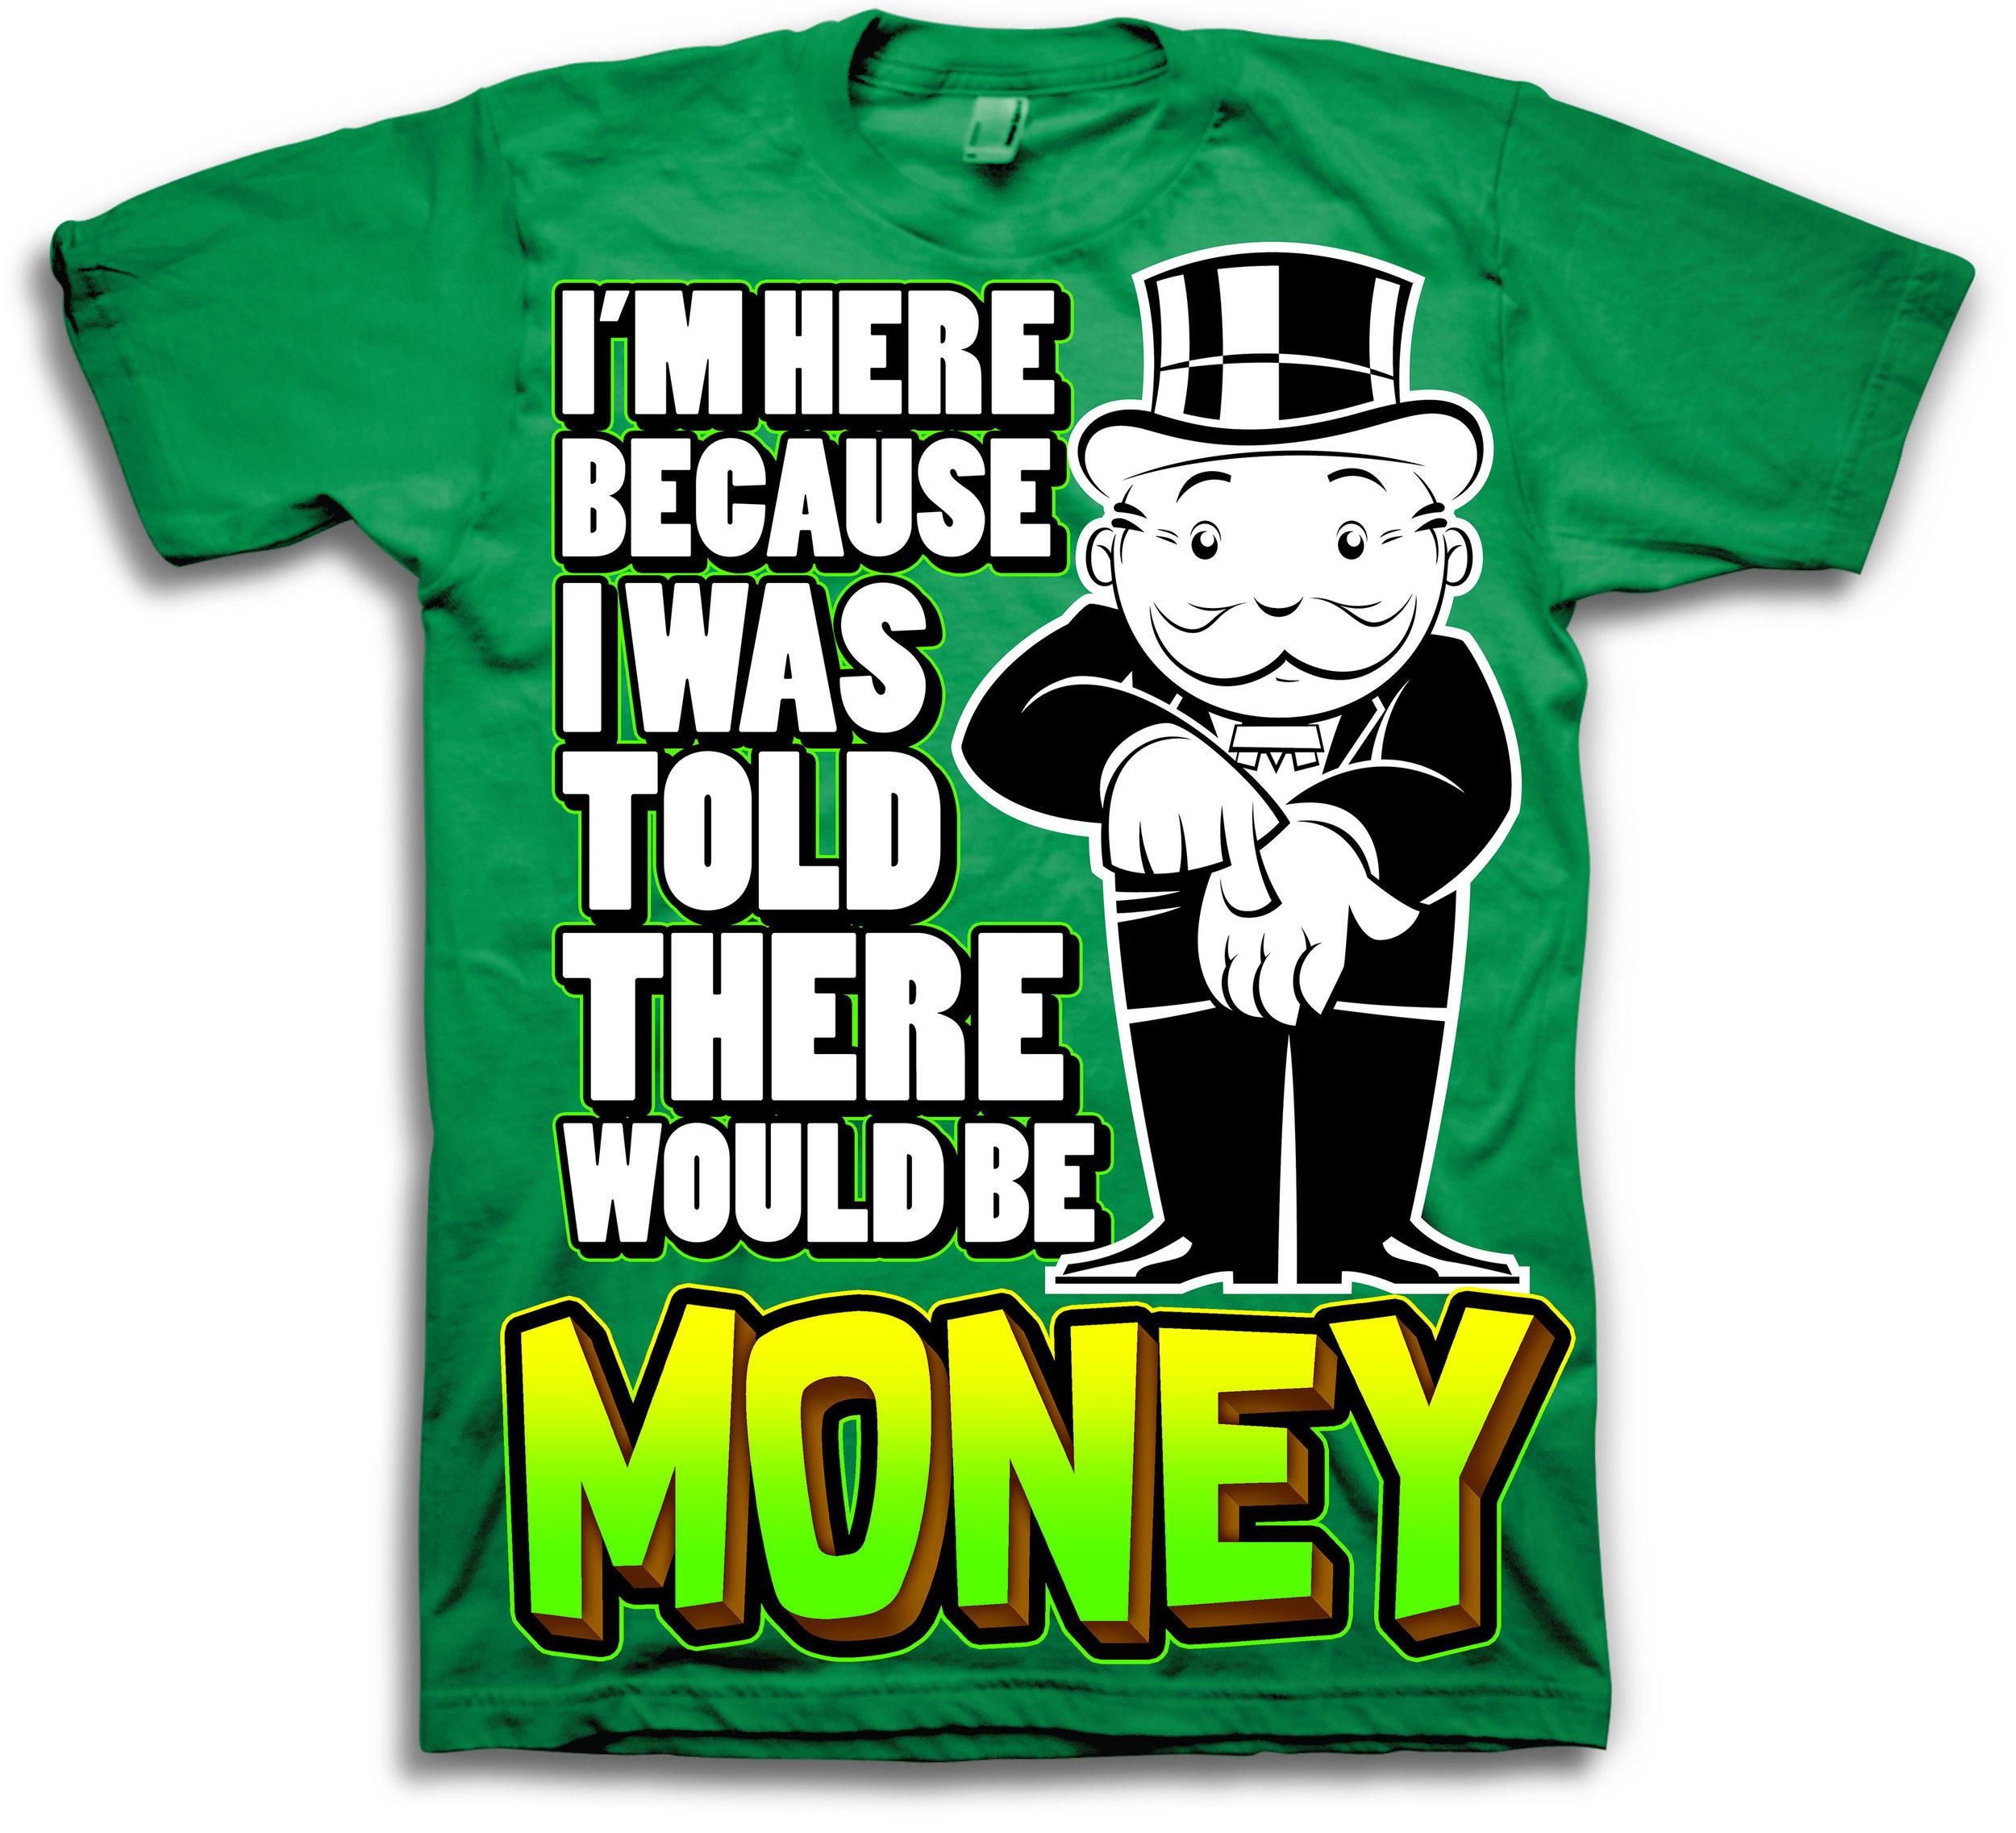 MONO_Money.jpg